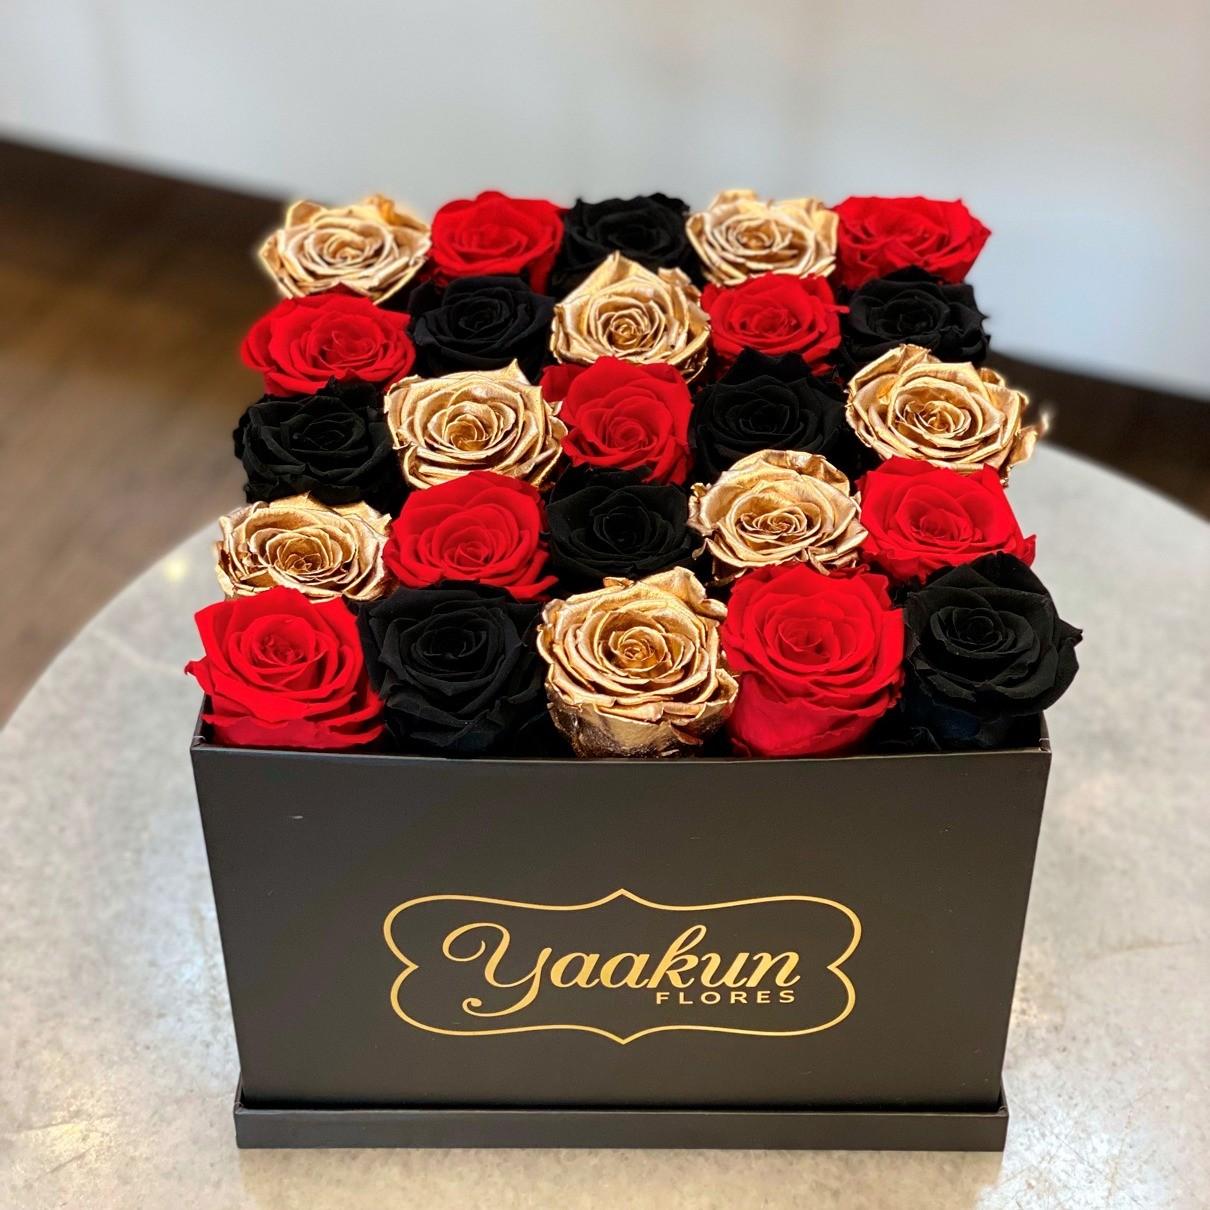 Rosas eternas en caja cuadrada red, black and gold